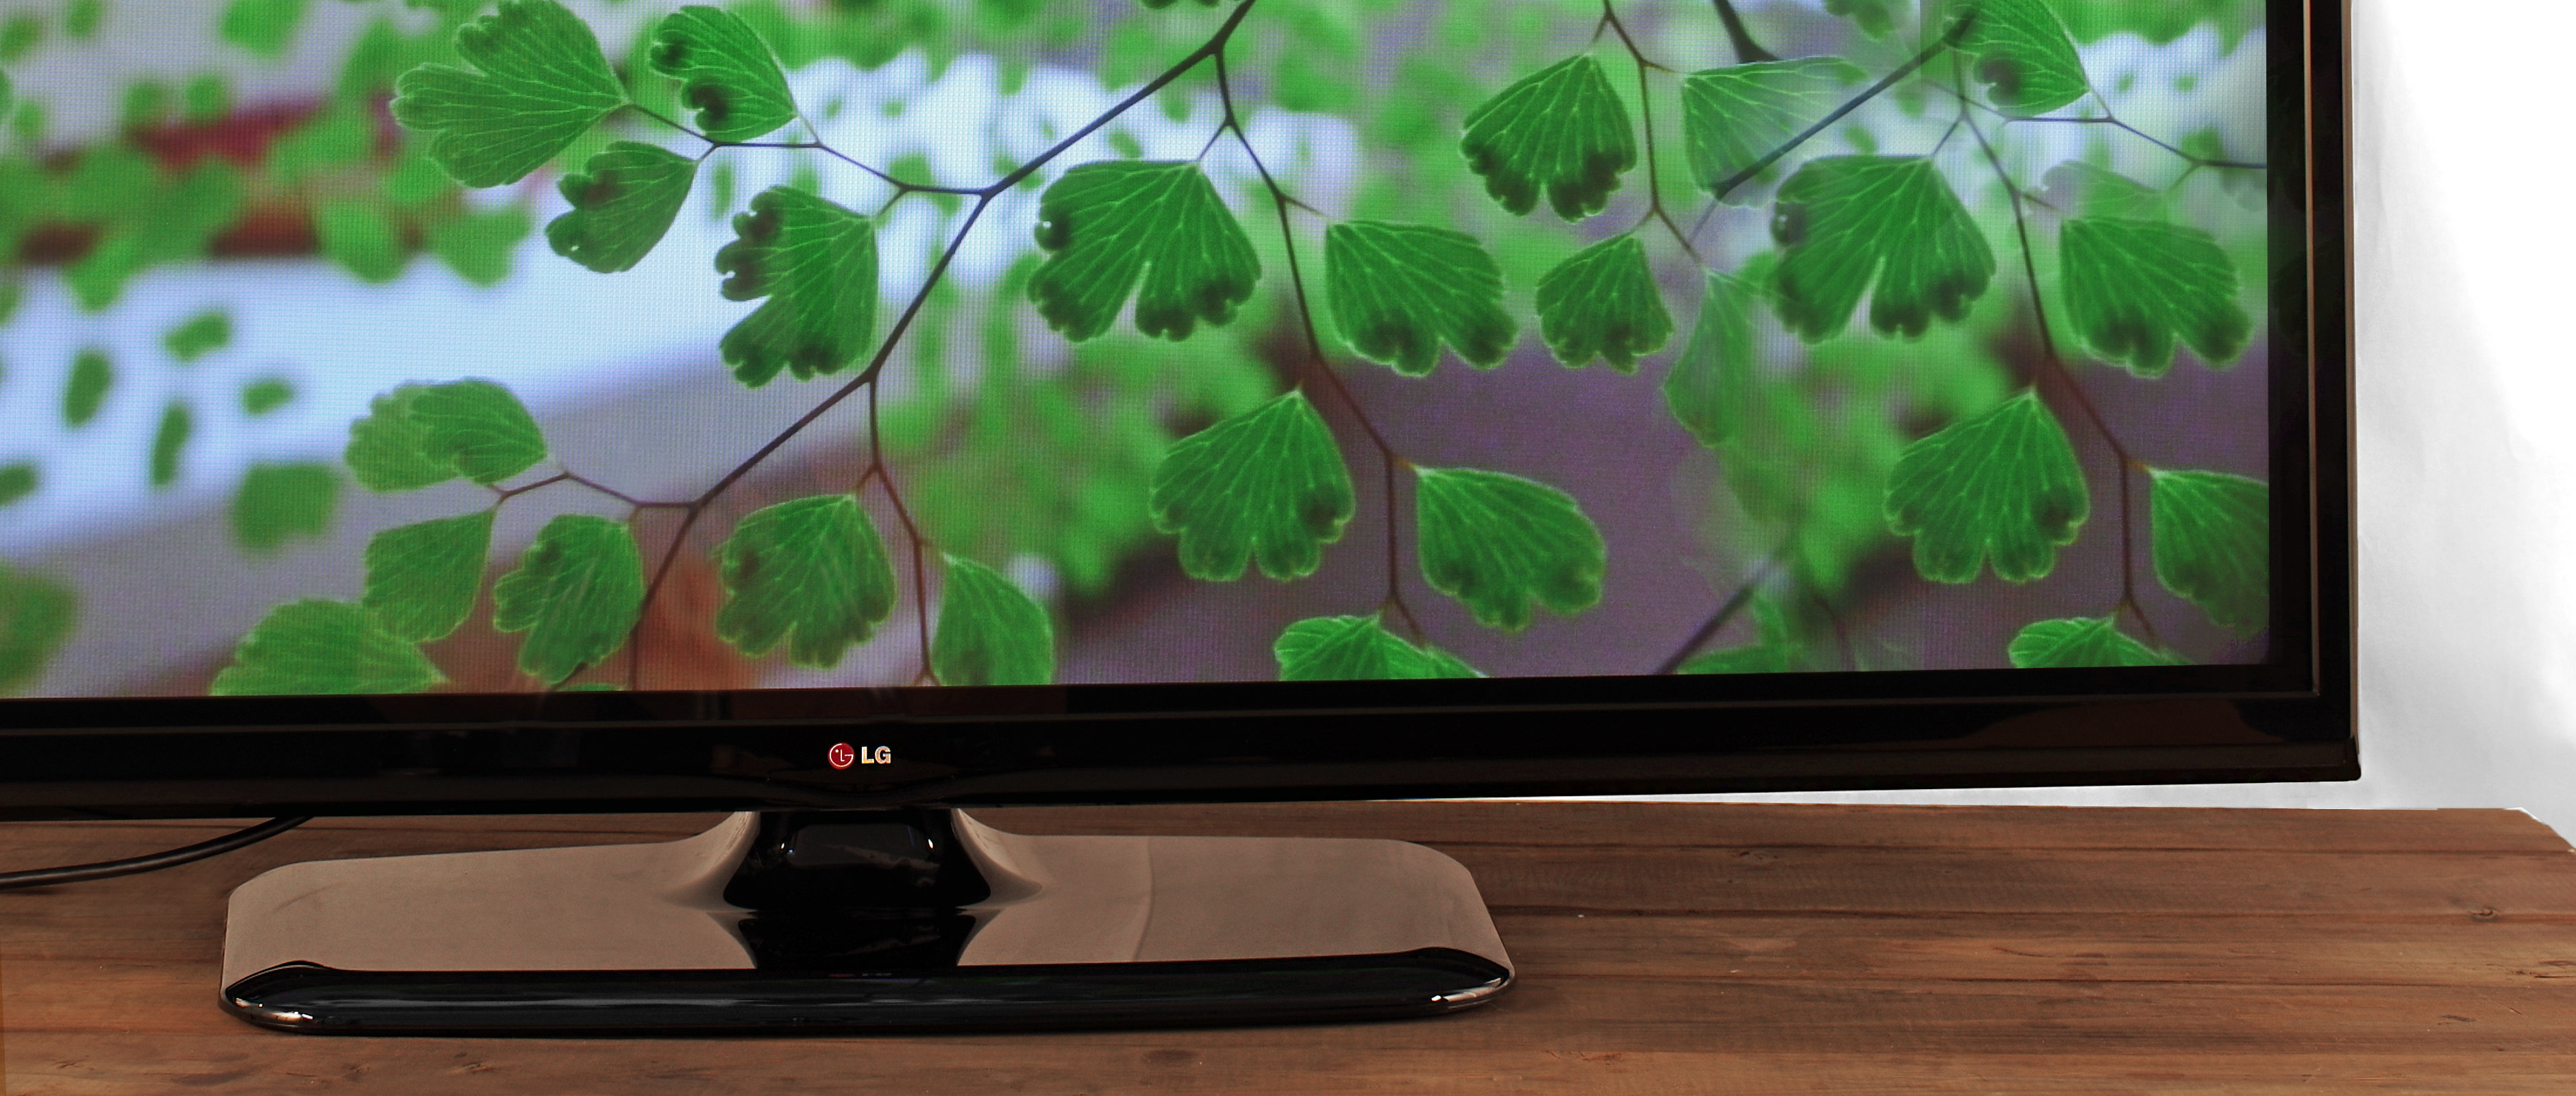 The LG 50PB6600 plasma TV